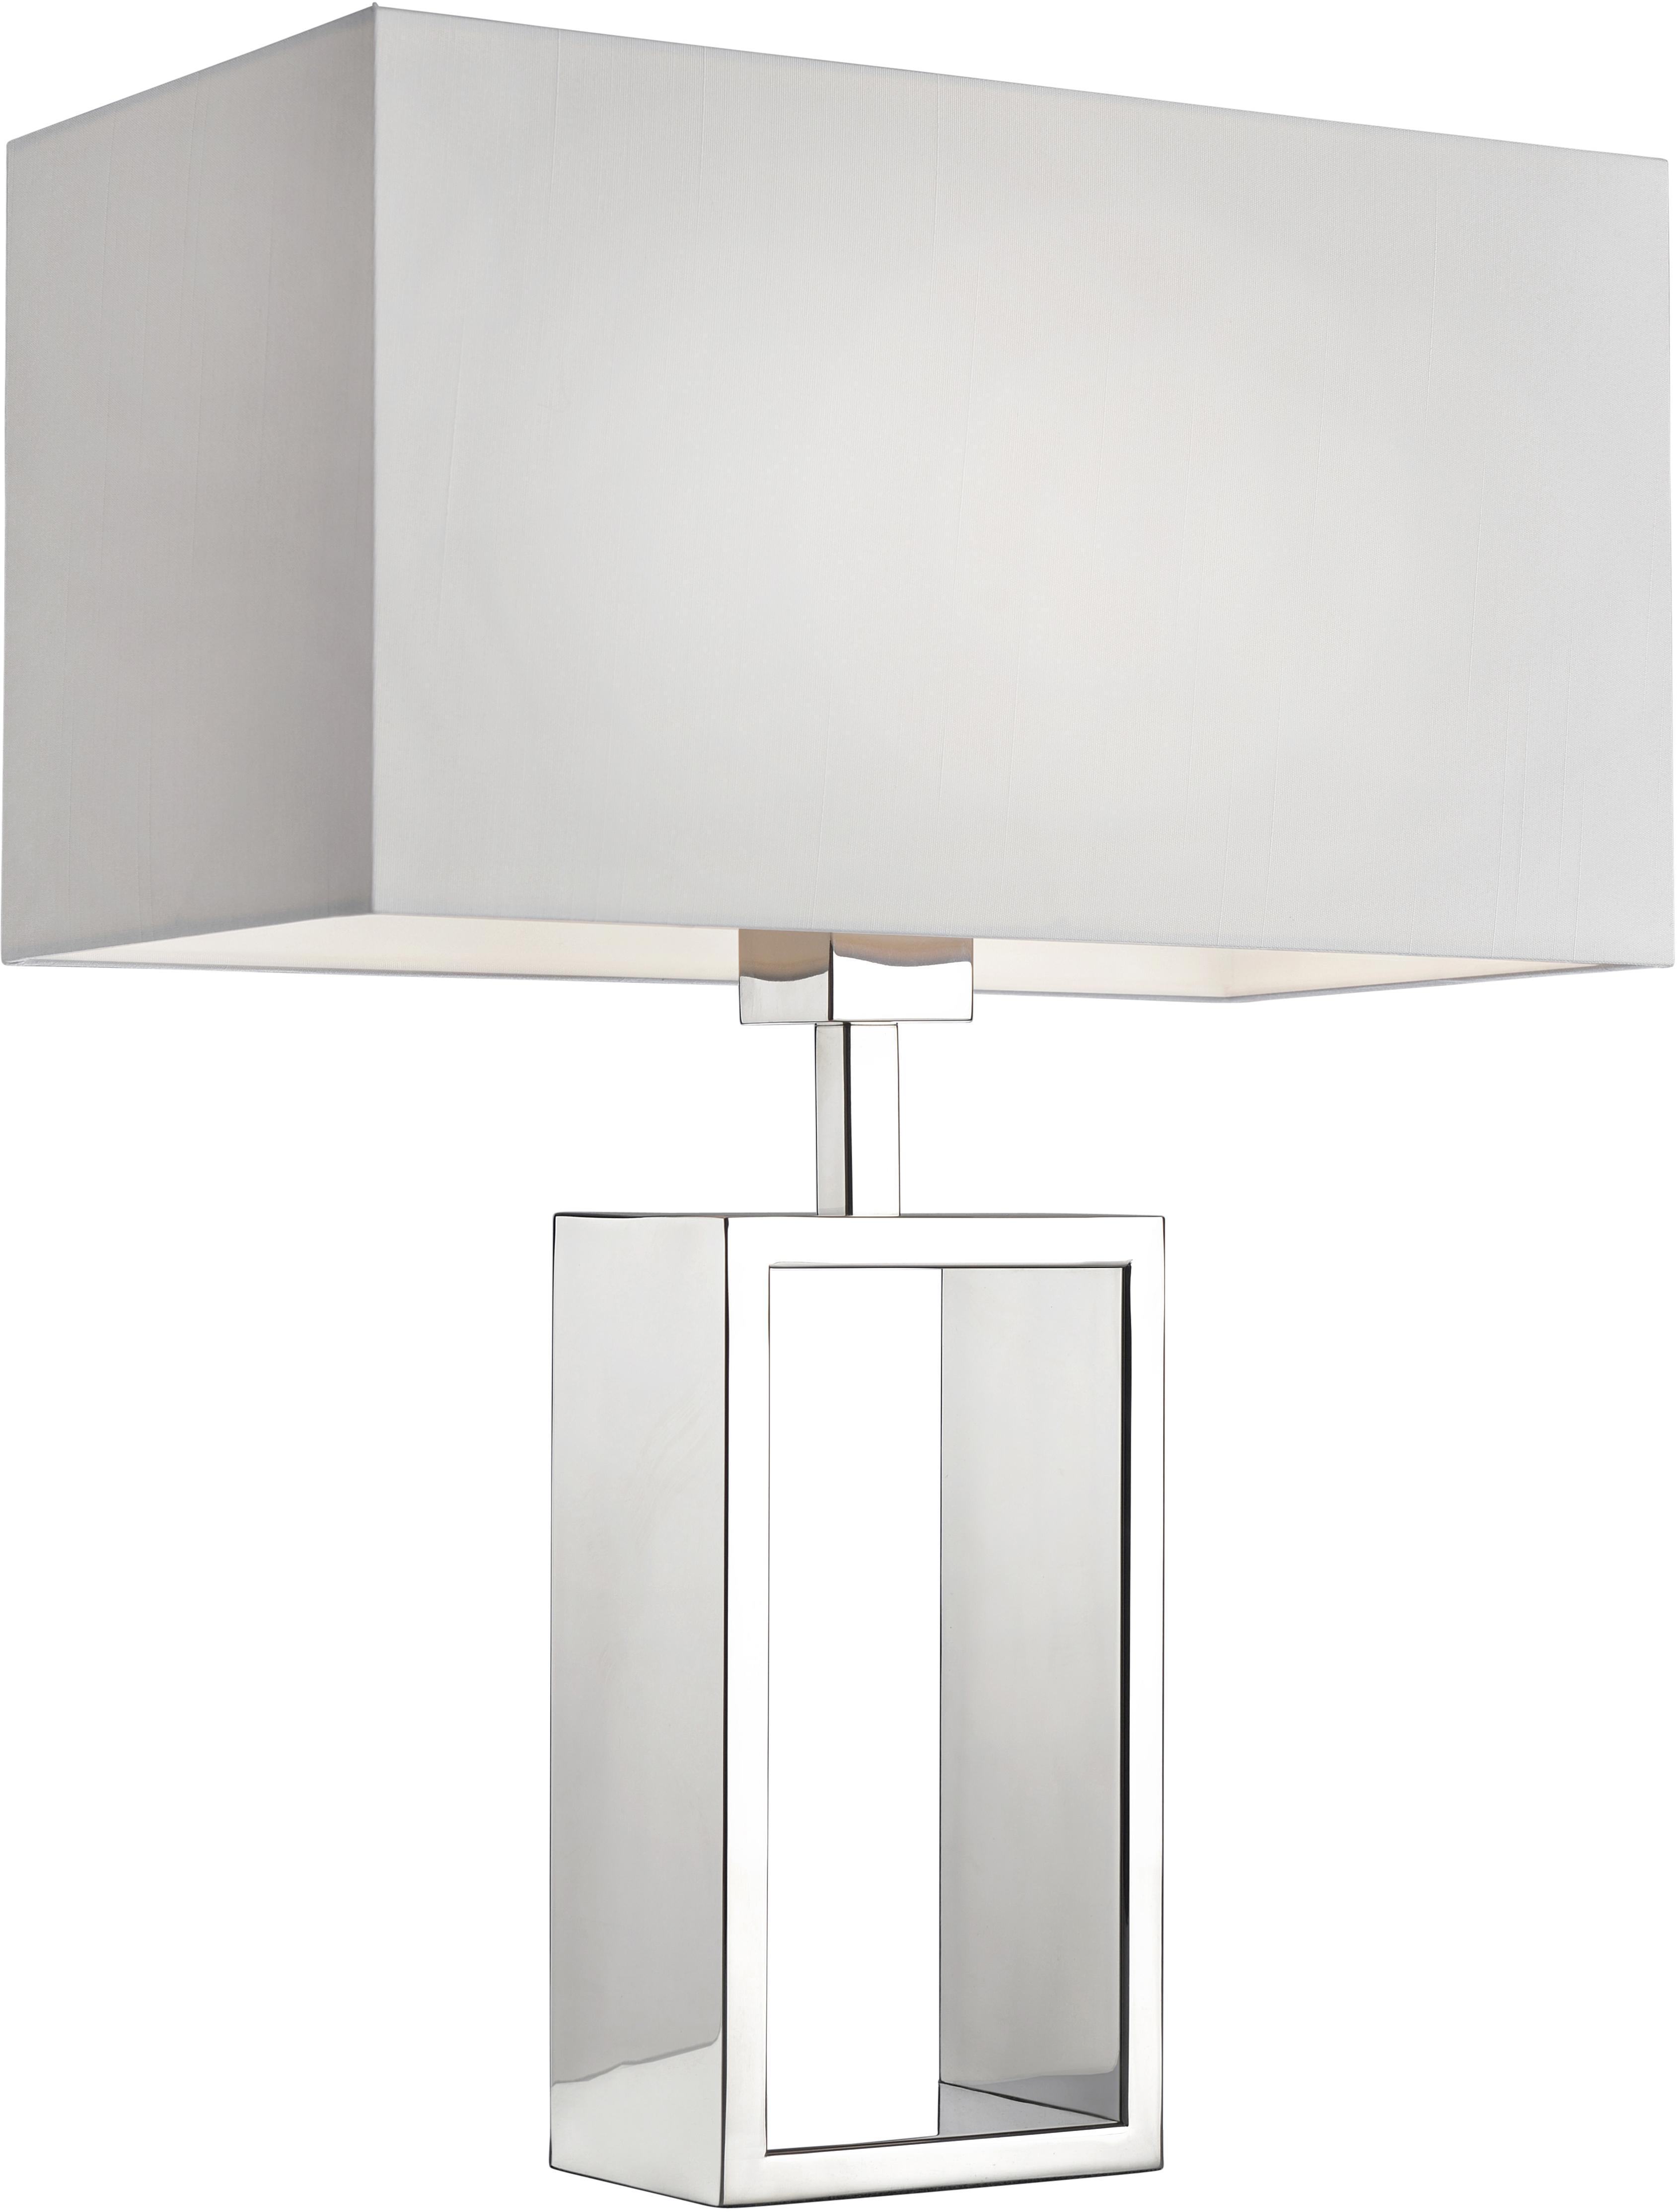 Tafellamp Shanghai, chroomkleurig, Lampvoet: hoogglanzend verchroomd e, Chroomkleurig, wit, 35 x 47 cm